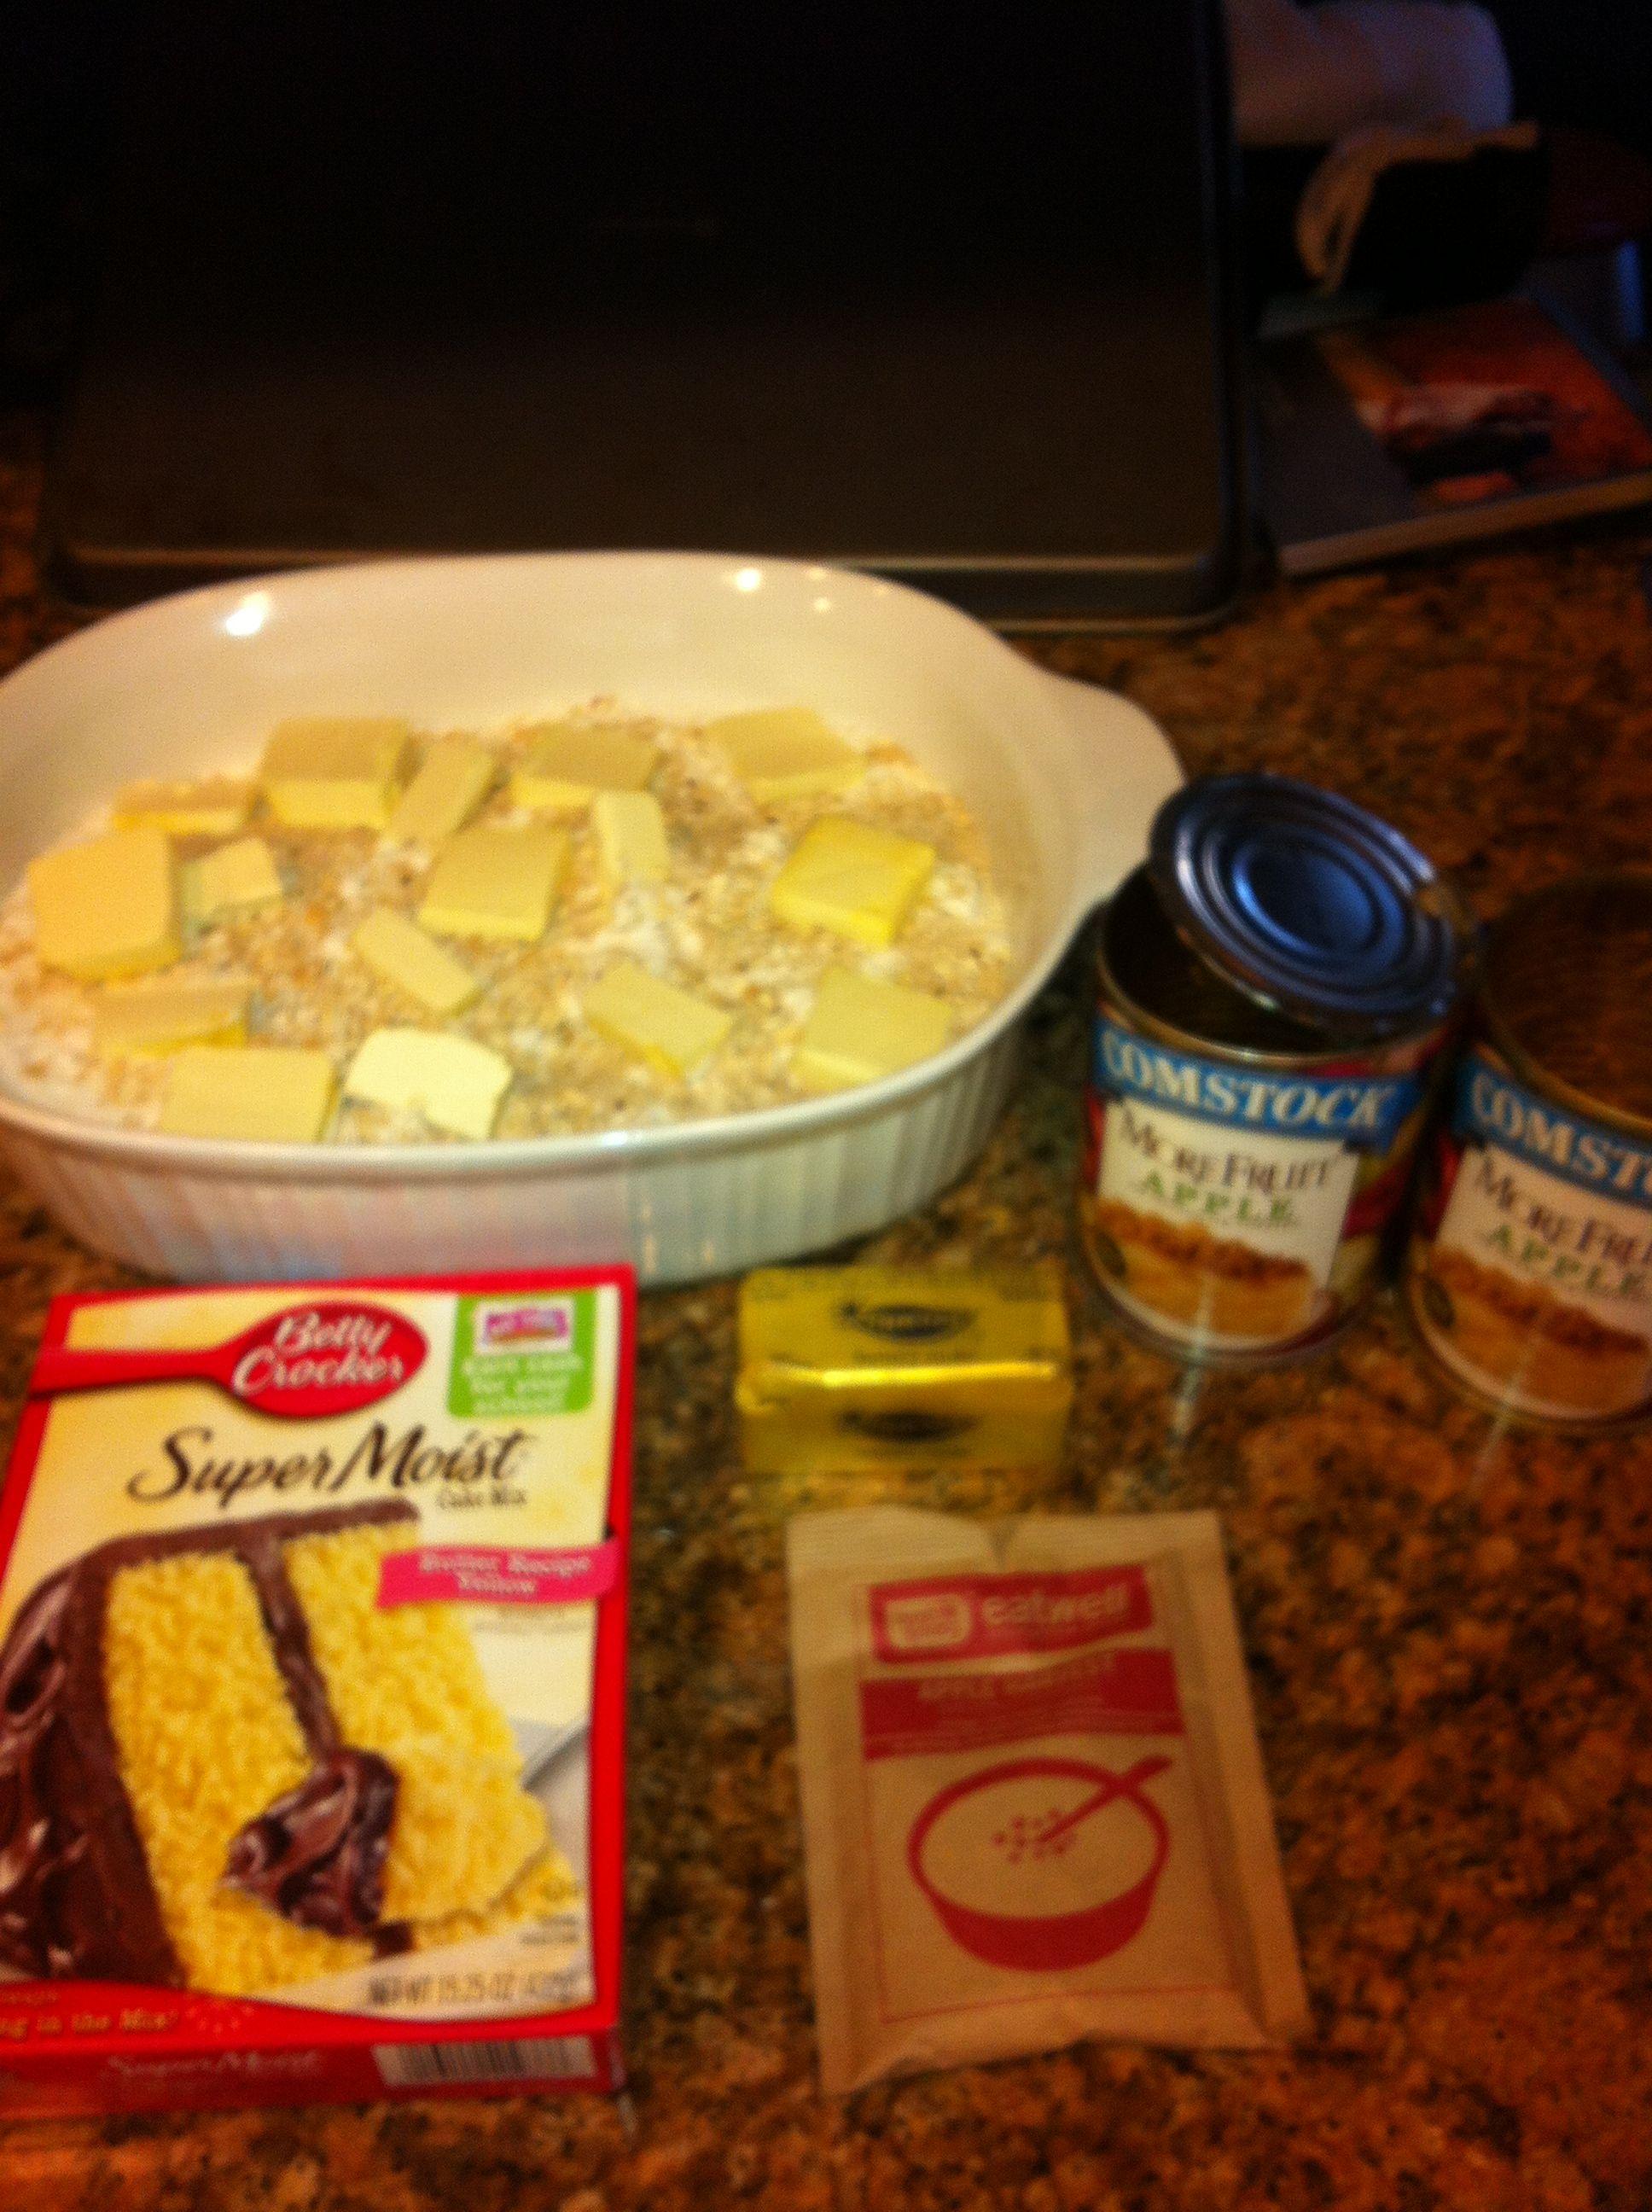 Apple Crumb Cake Aka Dump Cake 2 Cans Apple Pie Filling